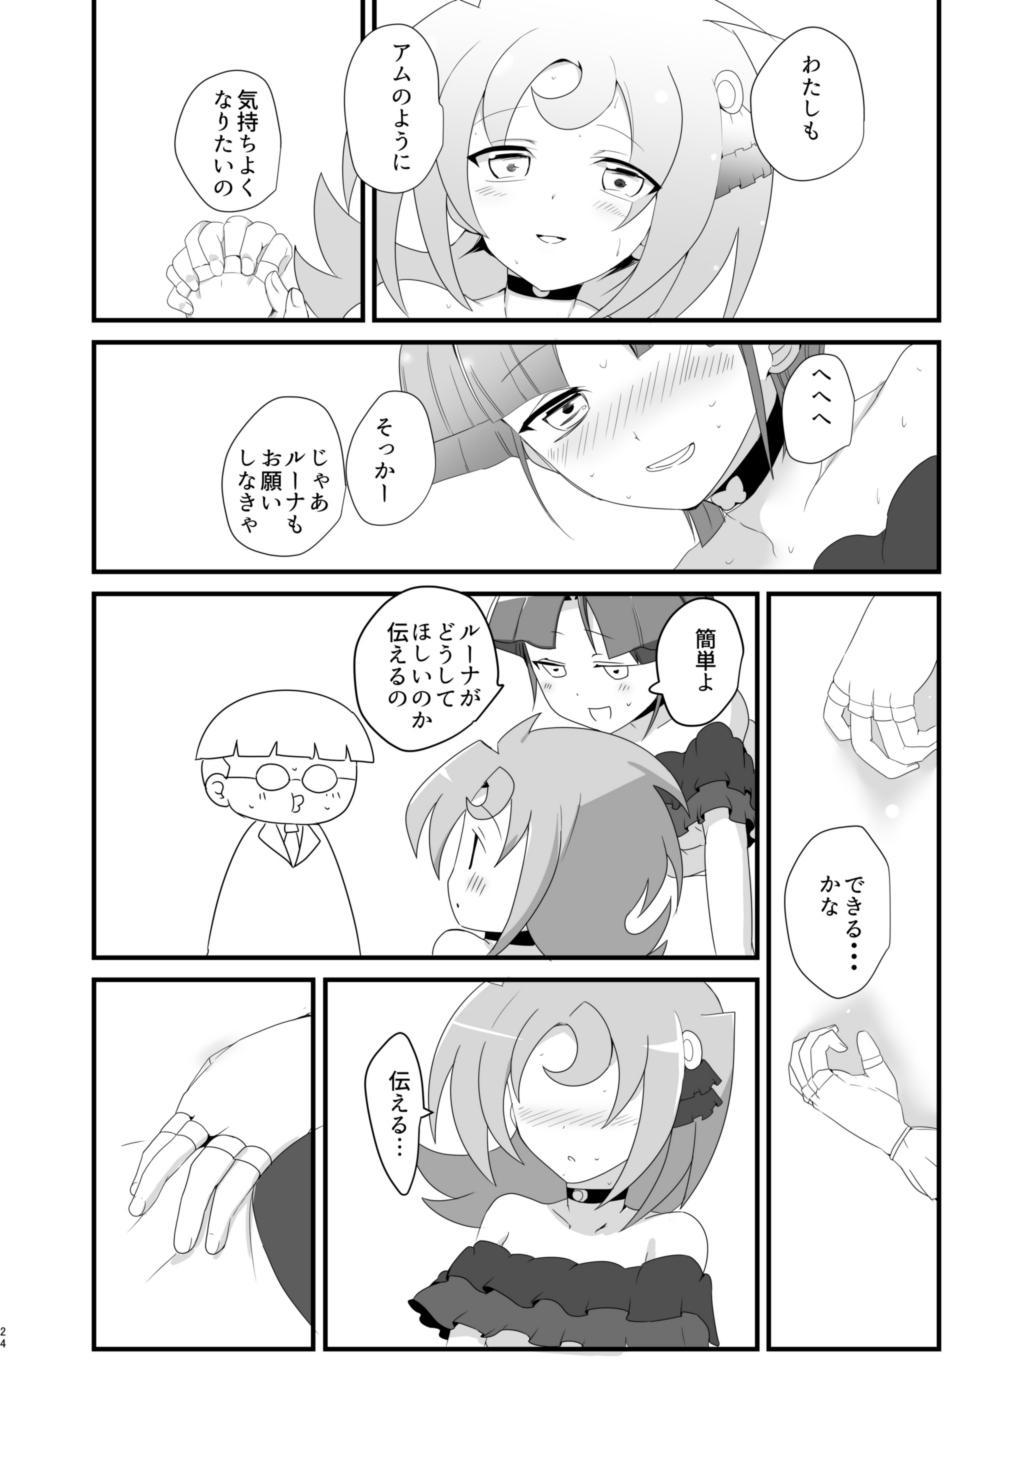 LunaAm O♂n♂n Akushuukai 22